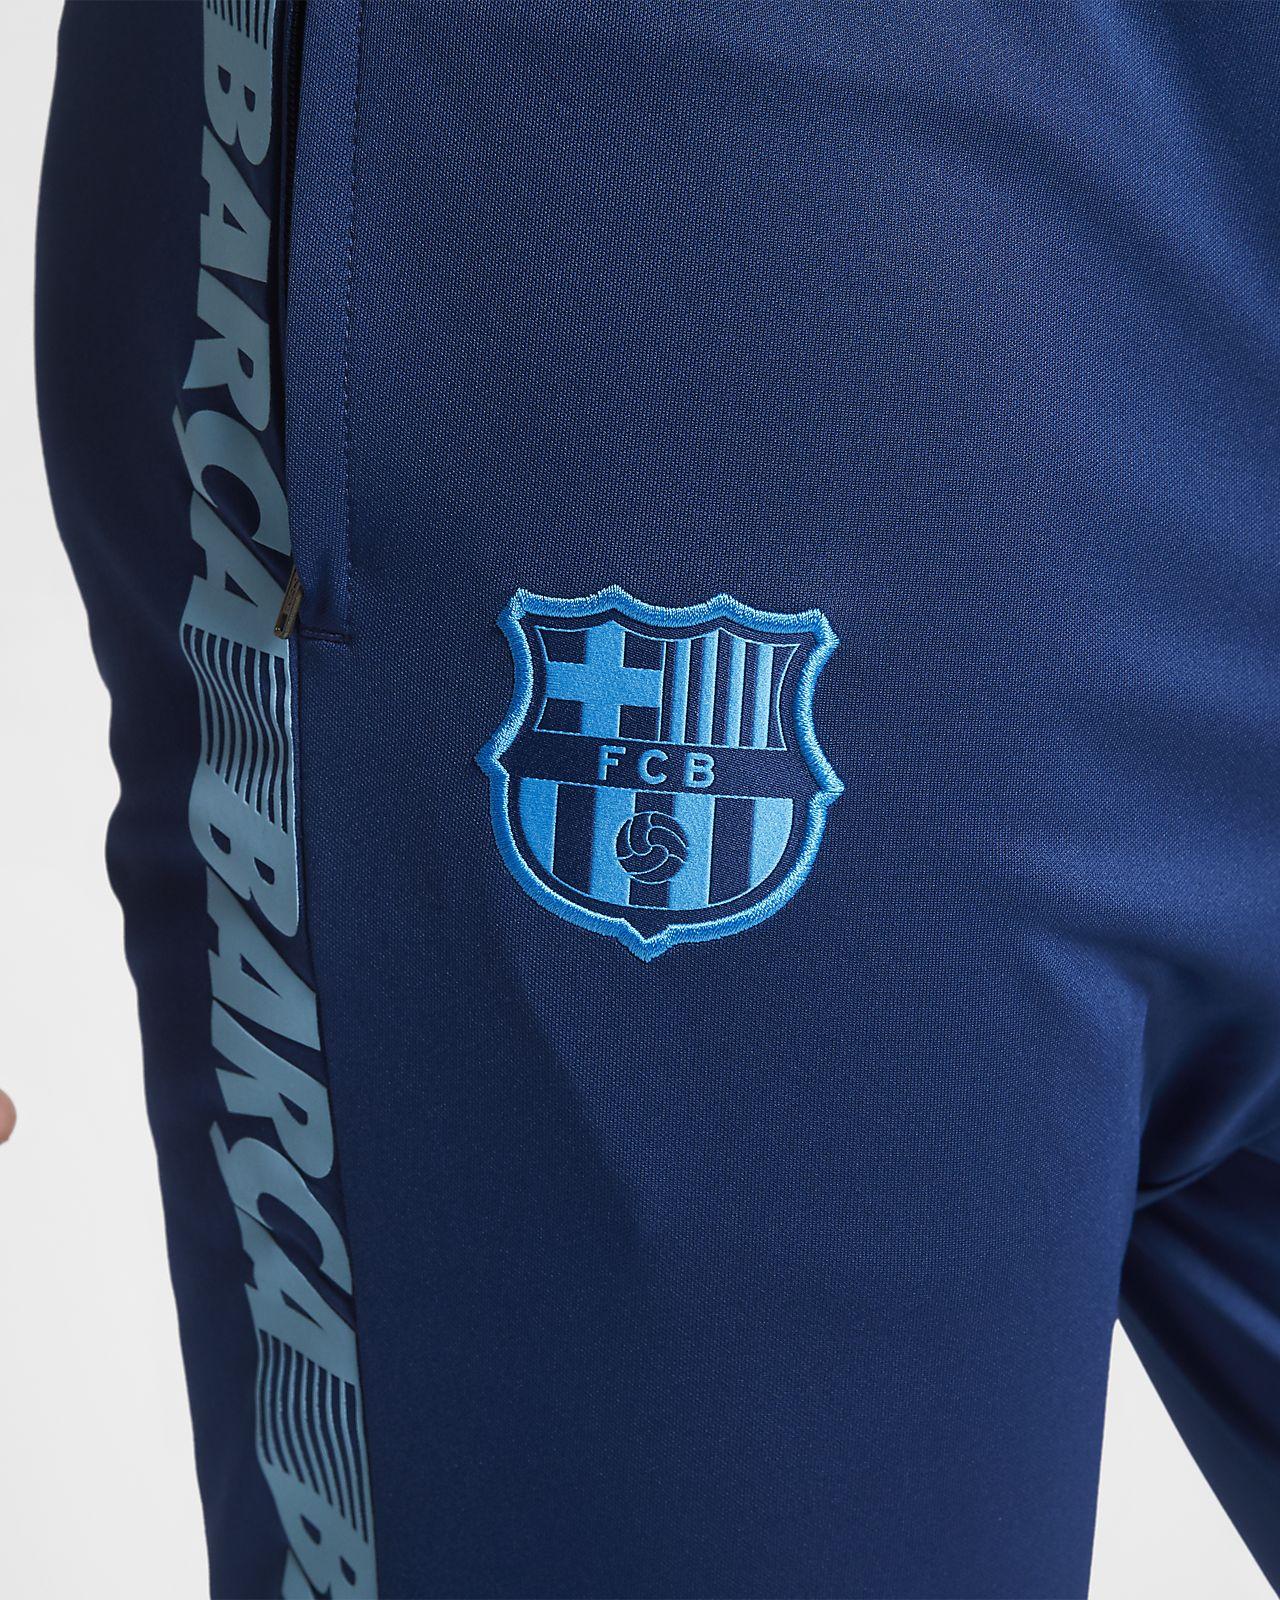 e2805ba3c6c6 FC Barcelona Dri-FIT Squad Men s Football Track Suit. Nike.com GB